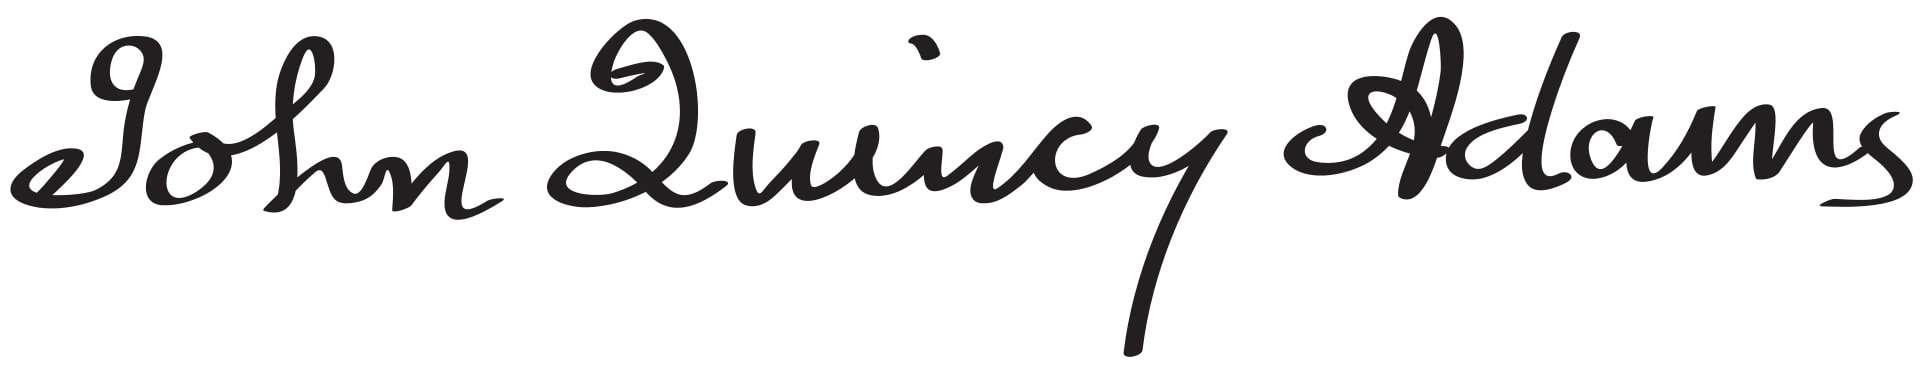 John Quincy Adams Signature